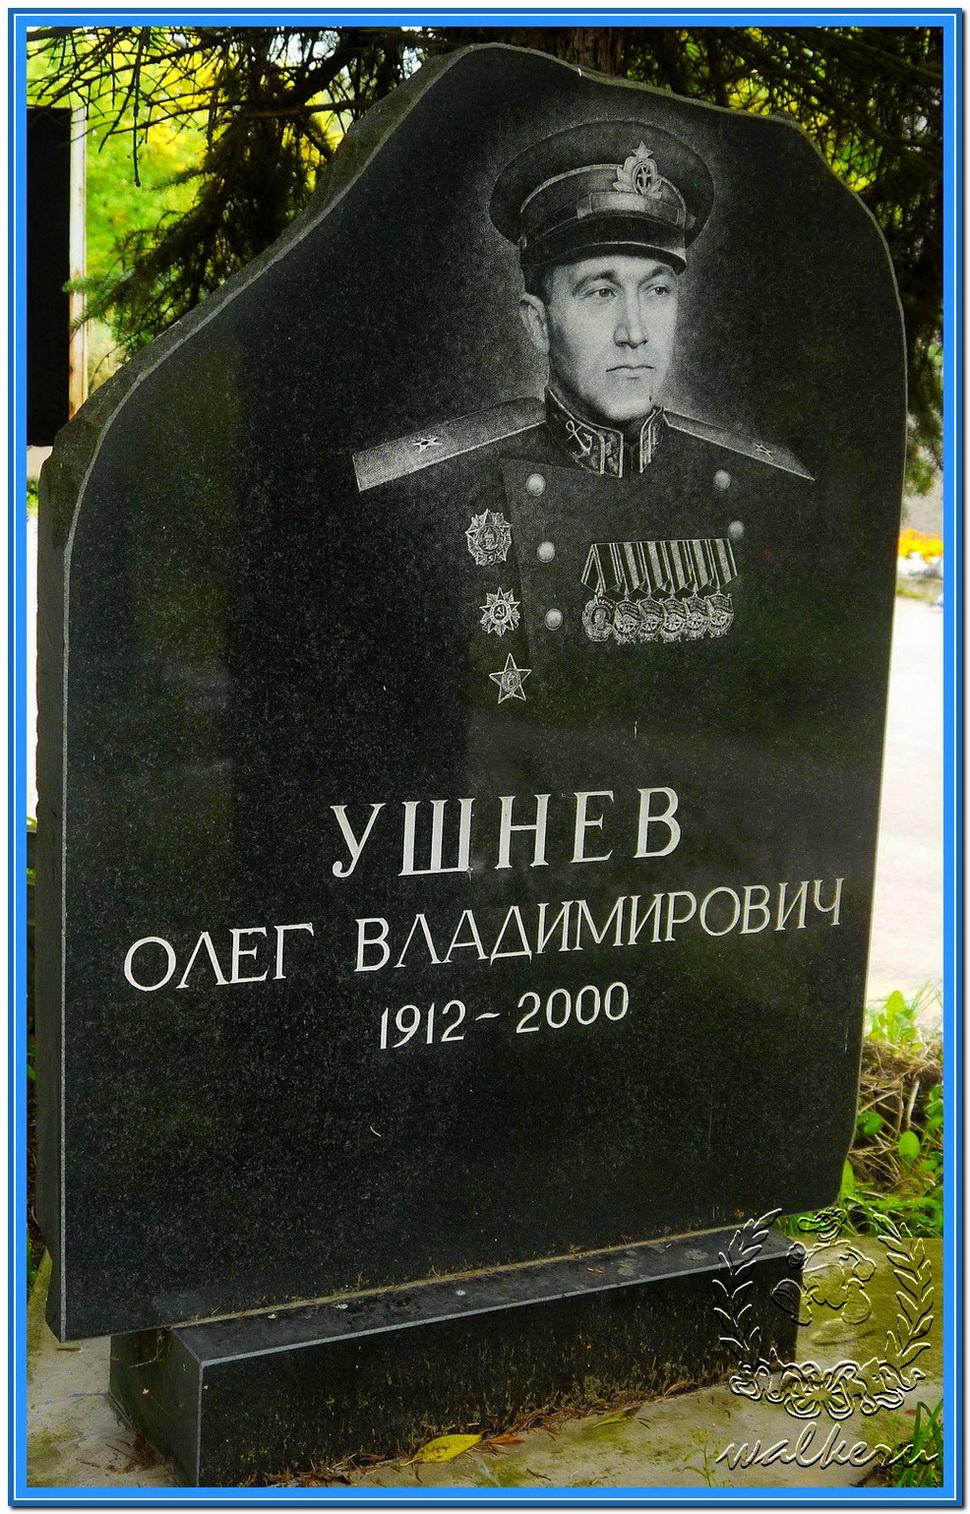 Ушнев Олег Владимирович